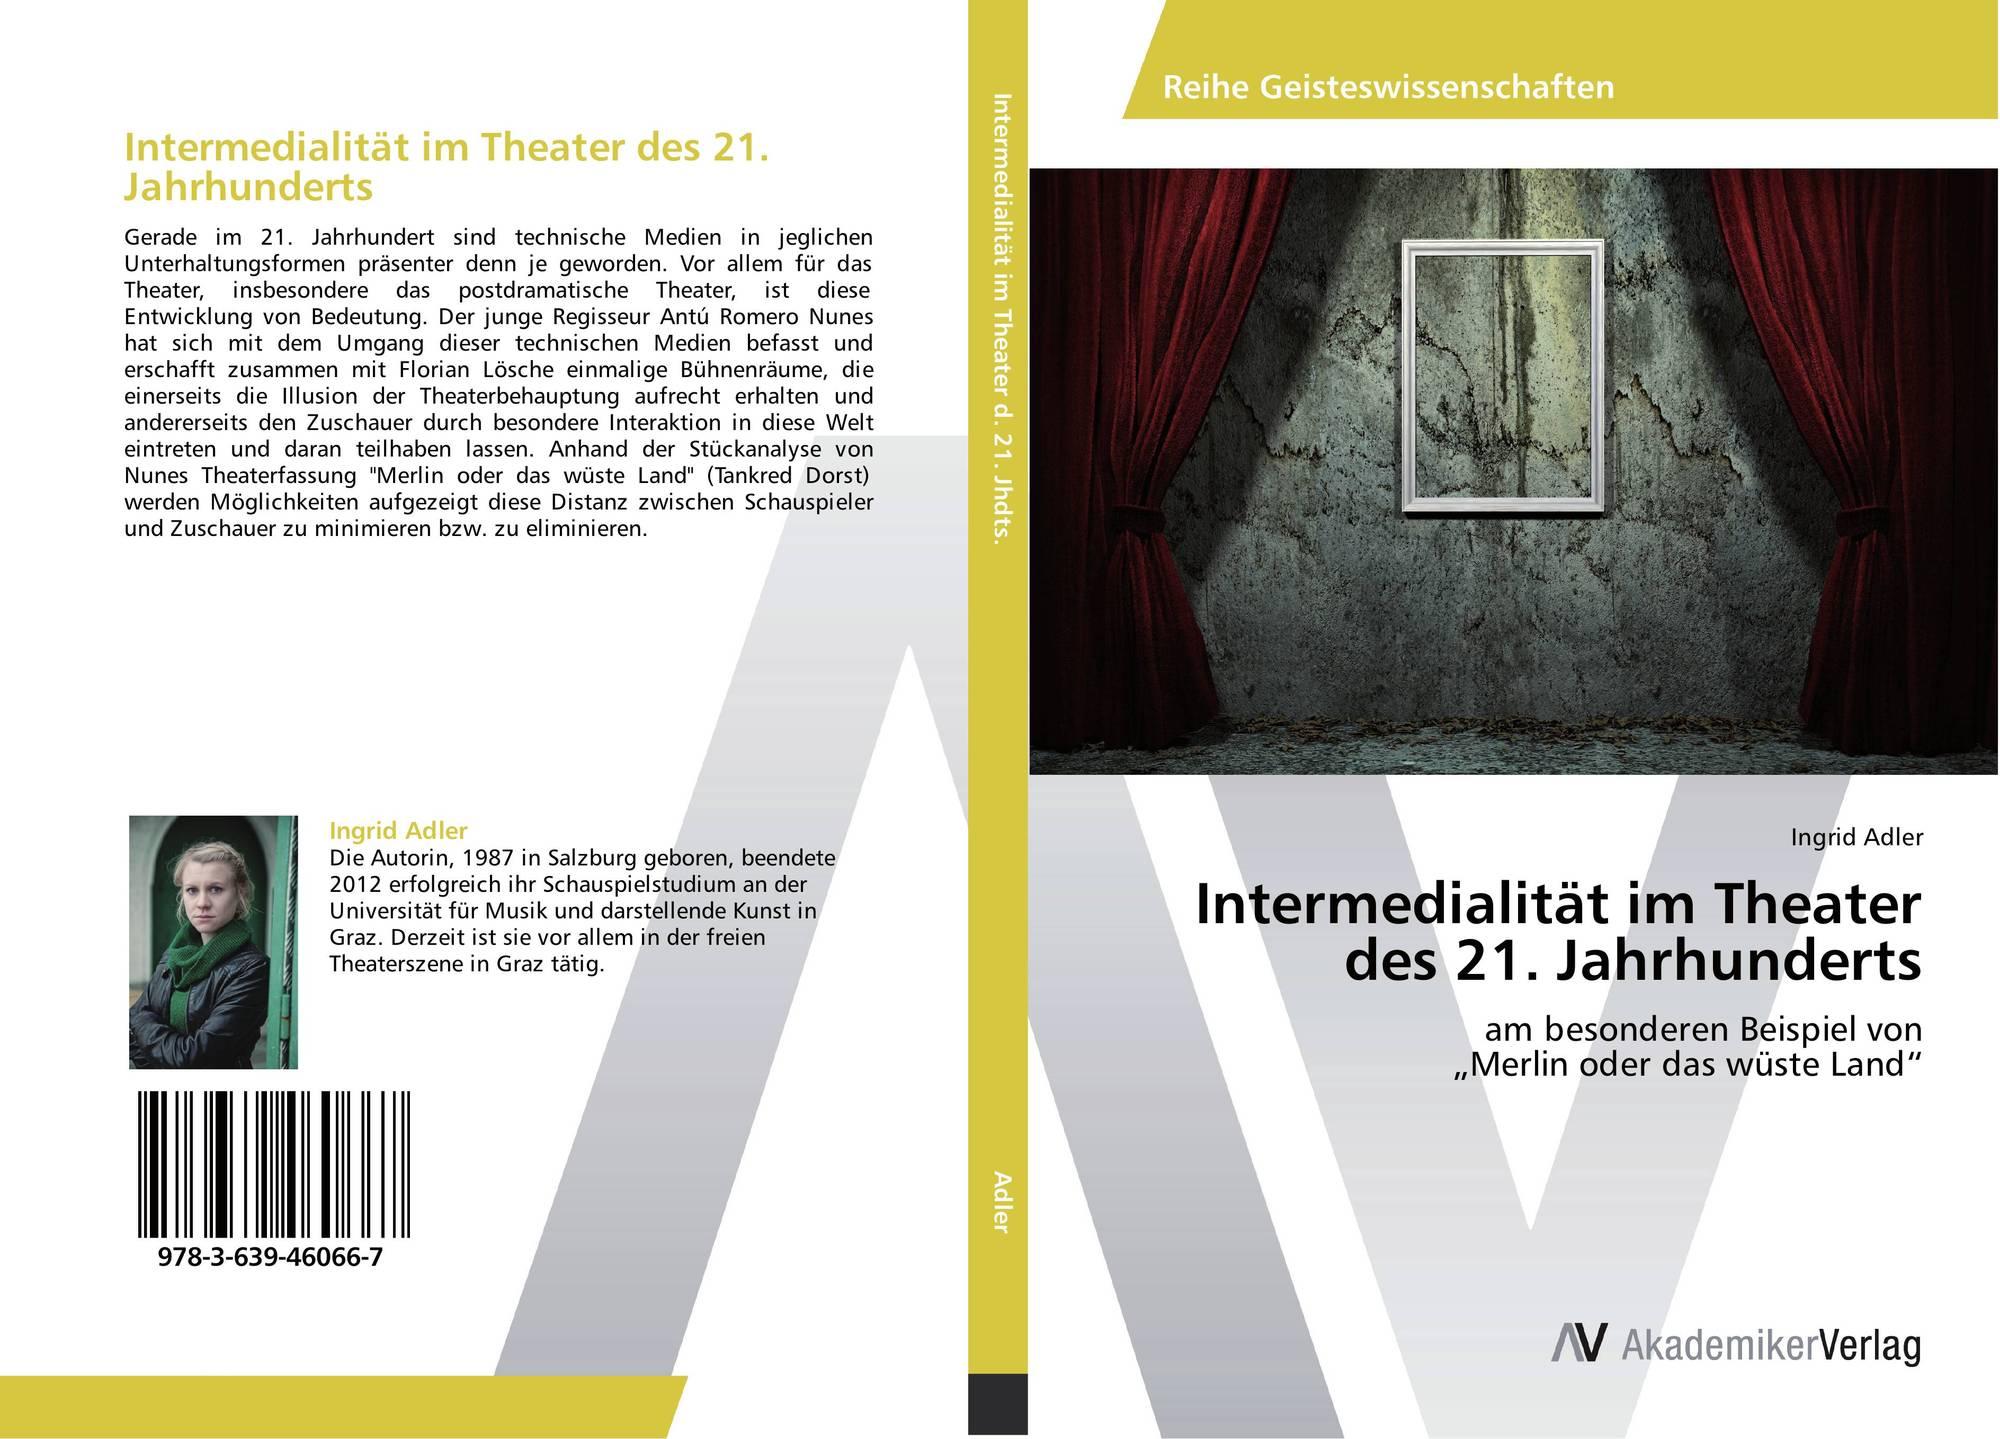 intermedialit t im theater des 21 jahrhunderts 978 3 639 46066 7 3639460669 9783639460667. Black Bedroom Furniture Sets. Home Design Ideas